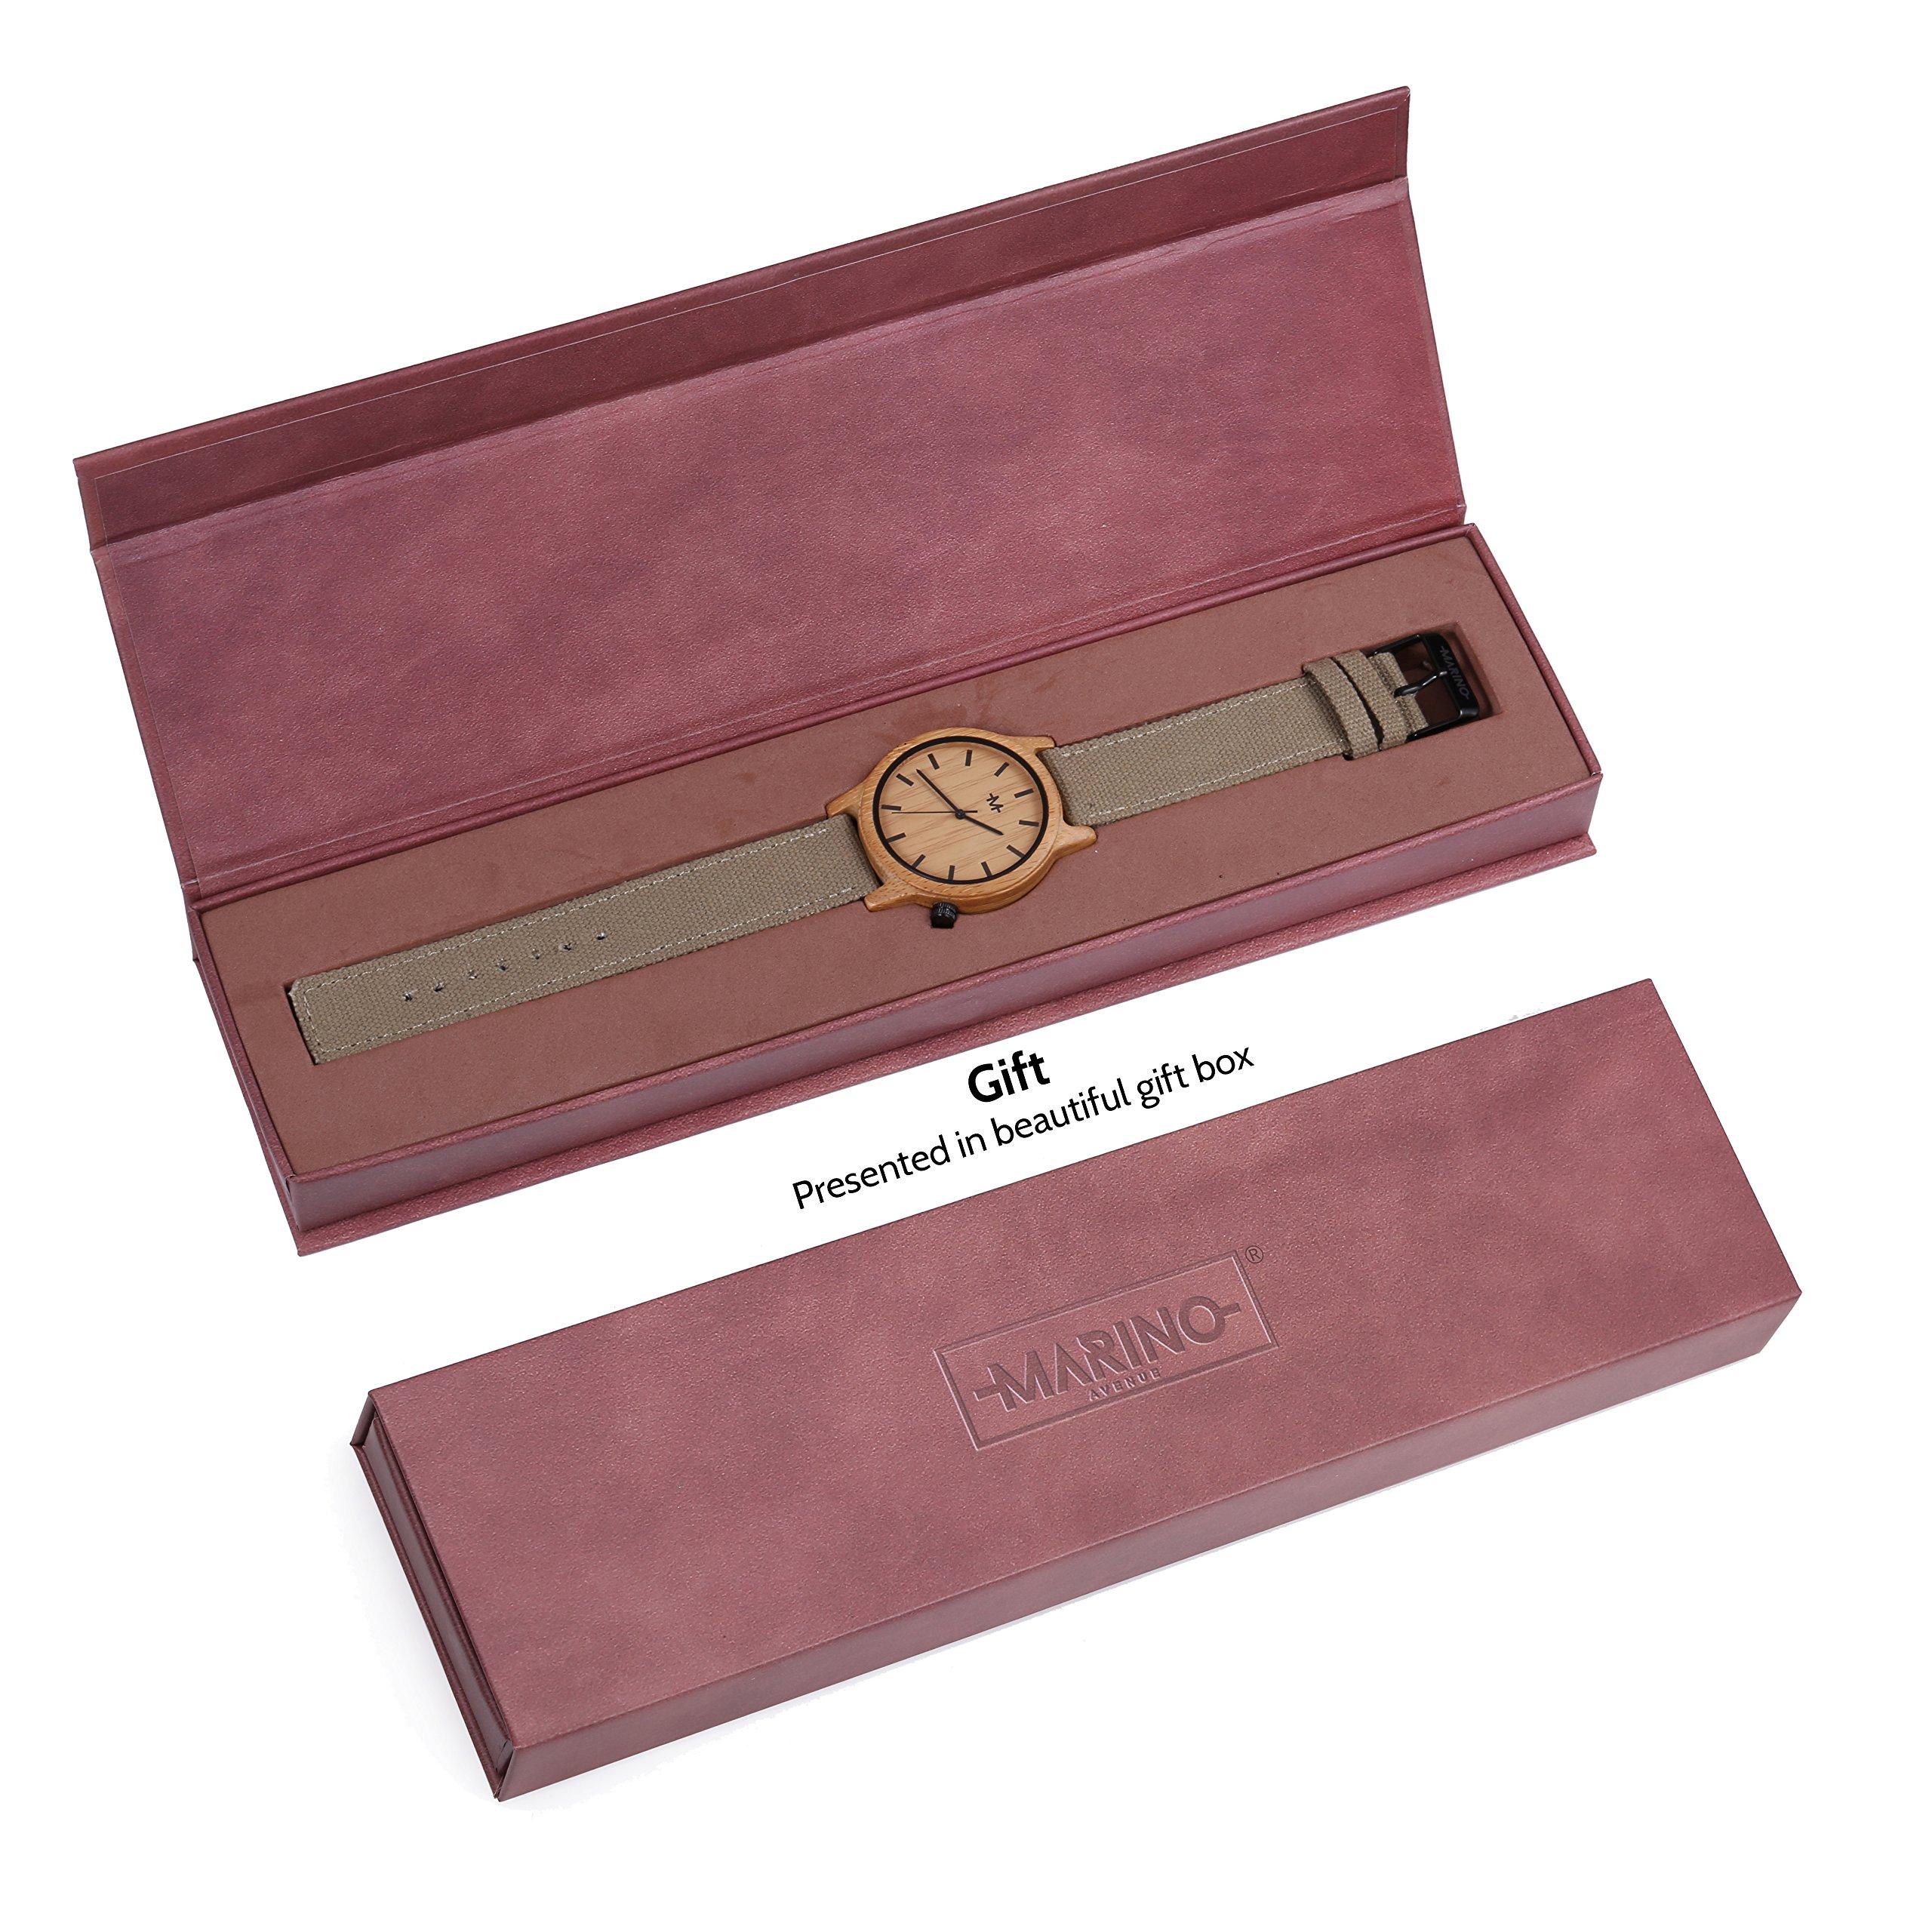 Marino Mens Wooden Watch - Wrist watches for Men - Dress Wood Watch (One Size, Khaki - Canvas Band) by Marino Avenue (Image #6)